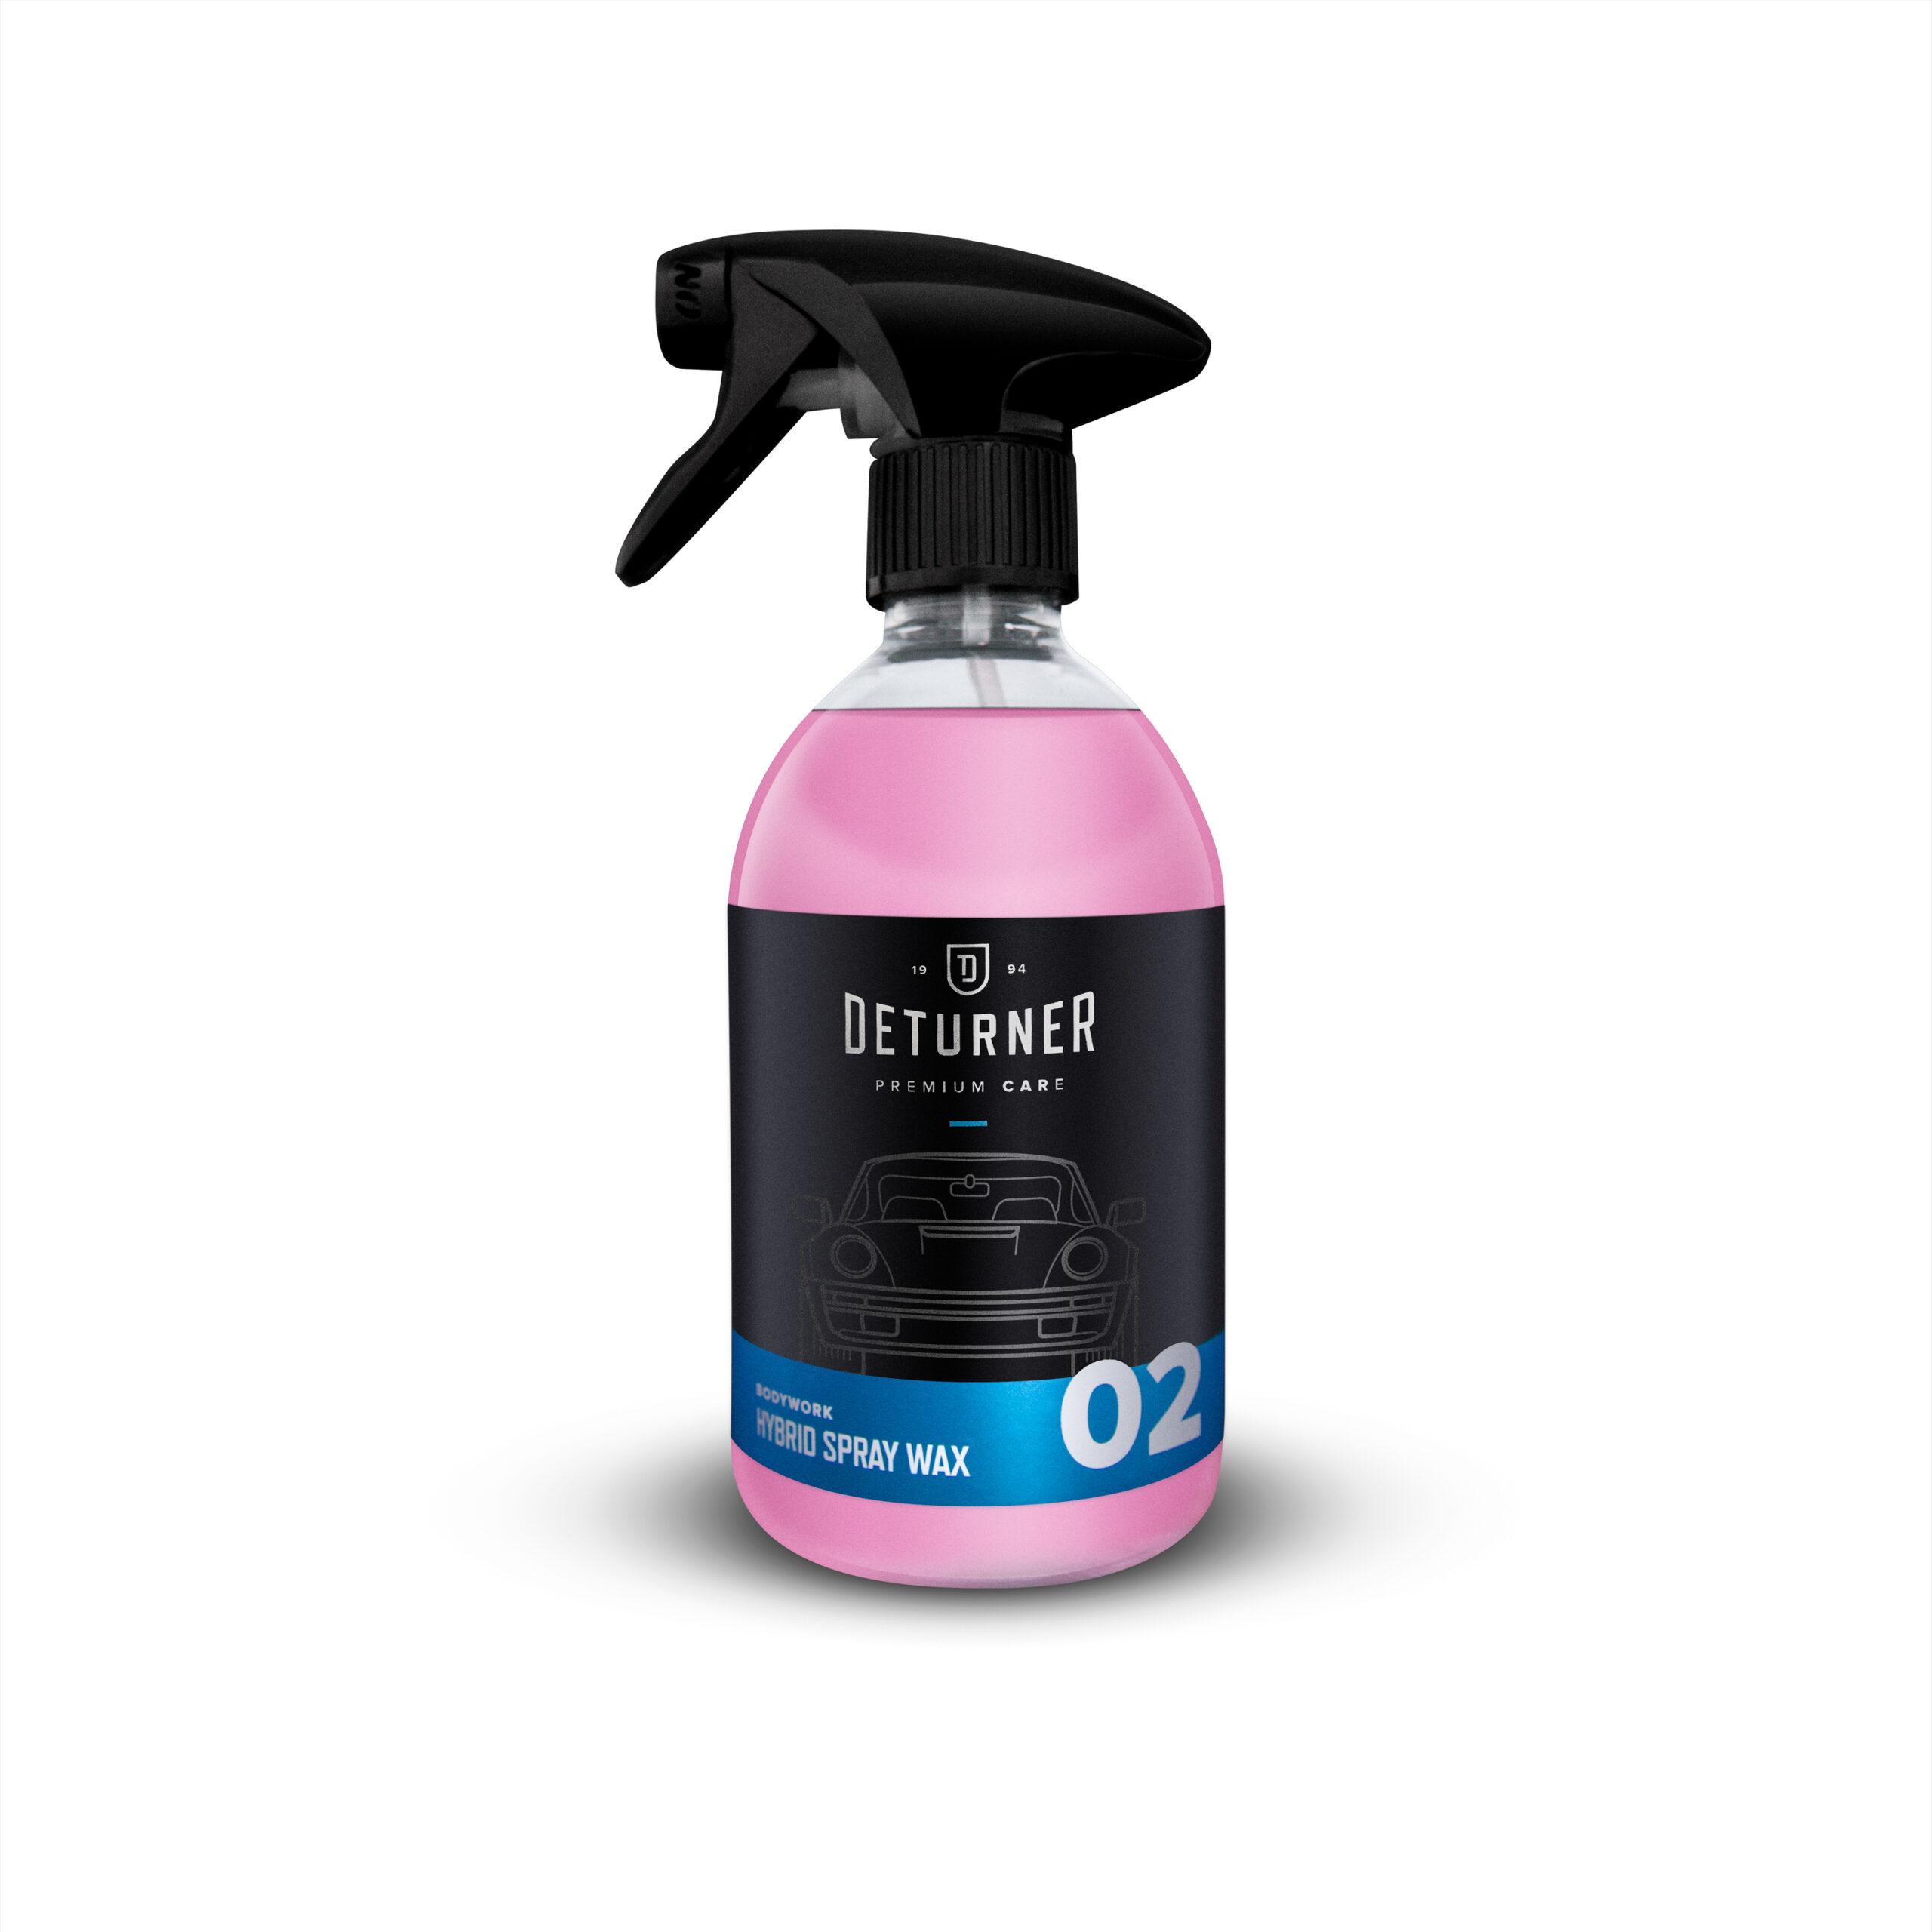 Deturner  Hybrid spray wax 500 ml